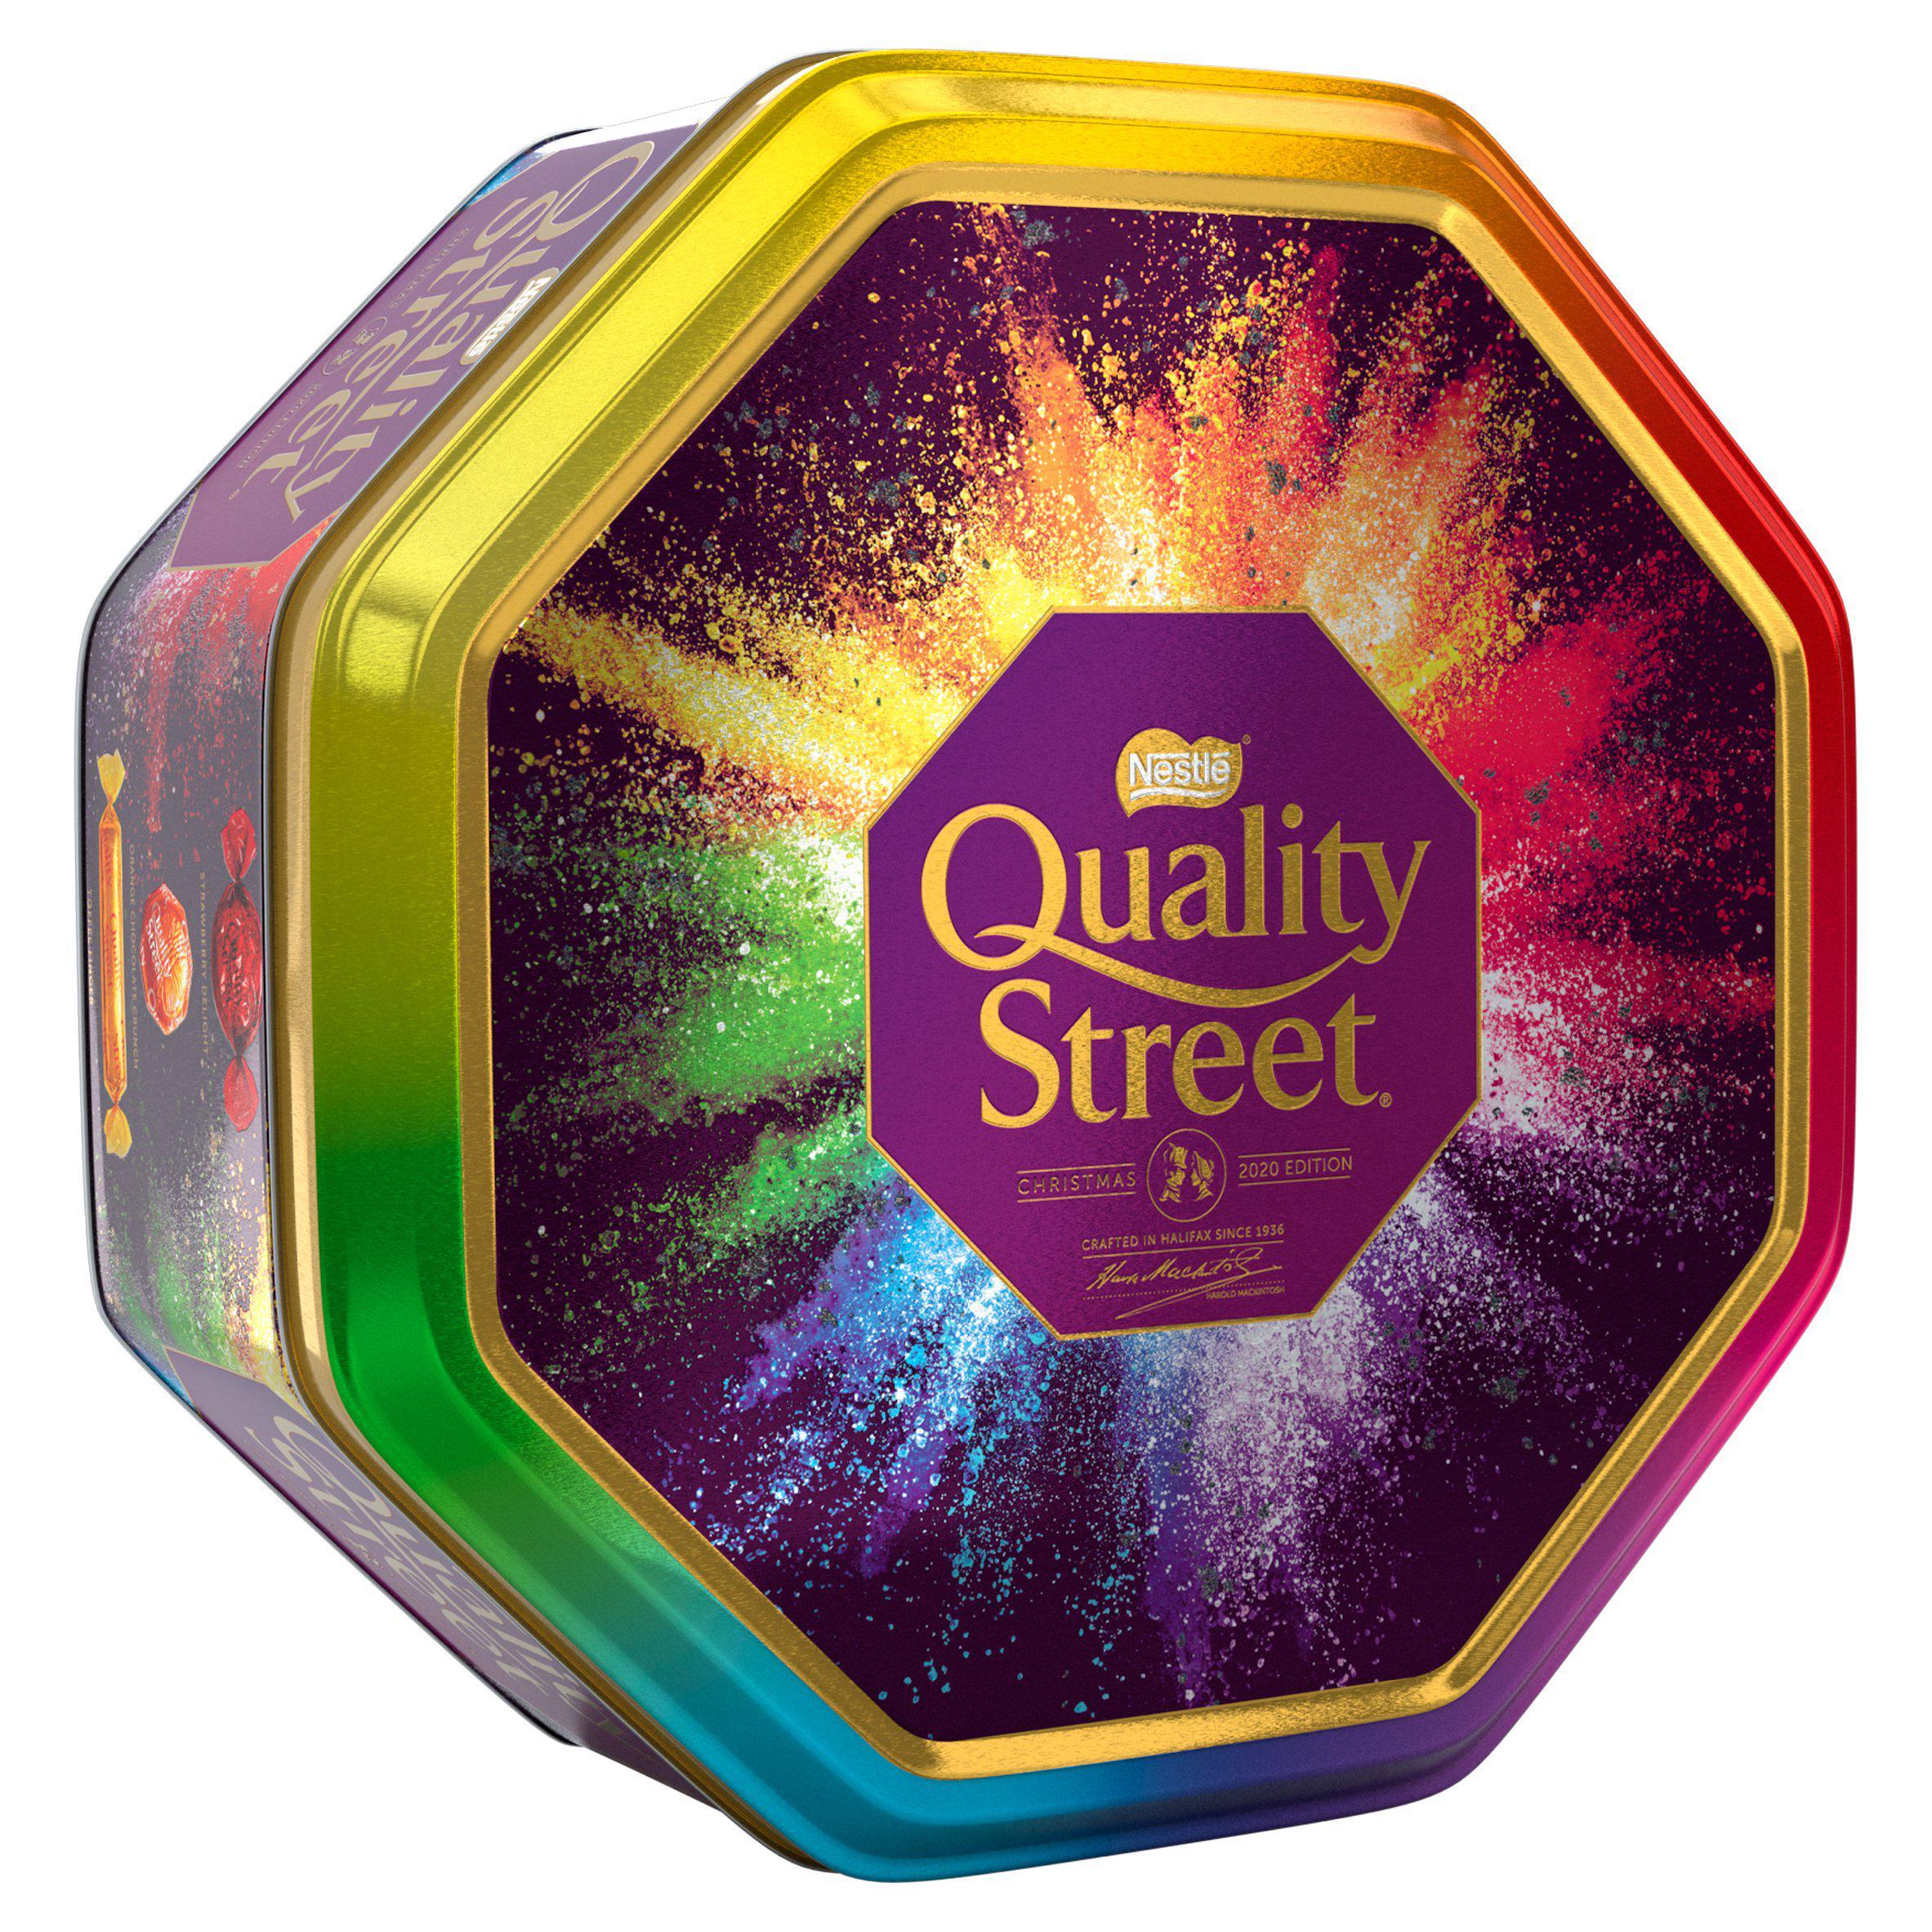 Quality Street Large Tin (1kg) - £3.75 @ Sainsbury's